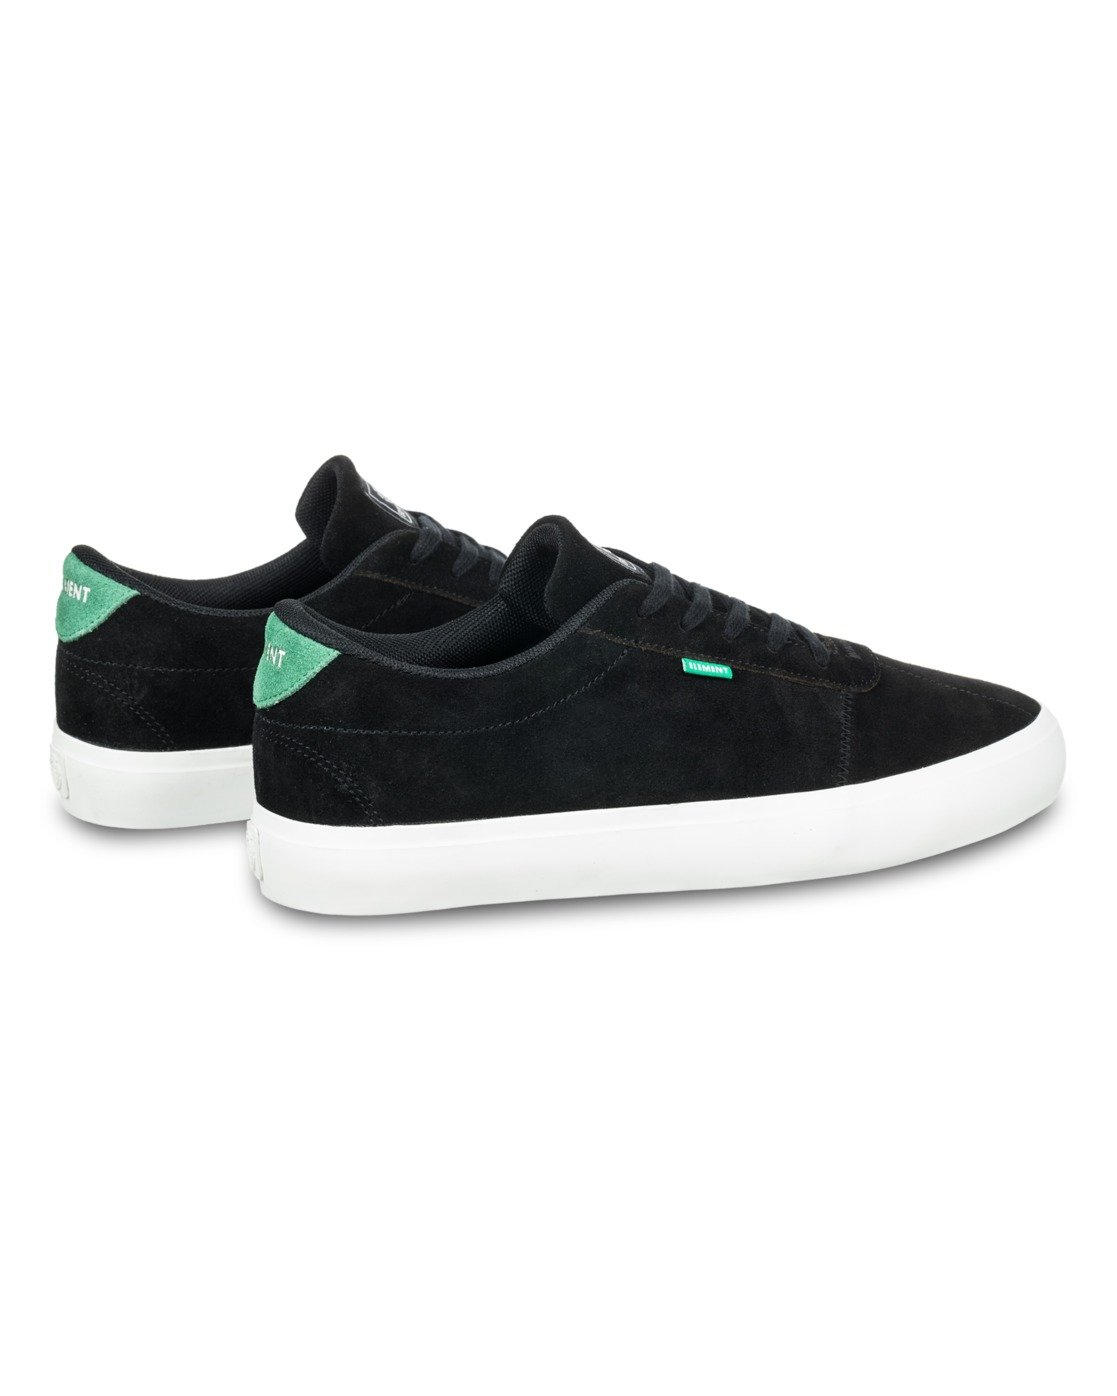 2 Sawyer - Shoes for Men Black W6SAW101 Element